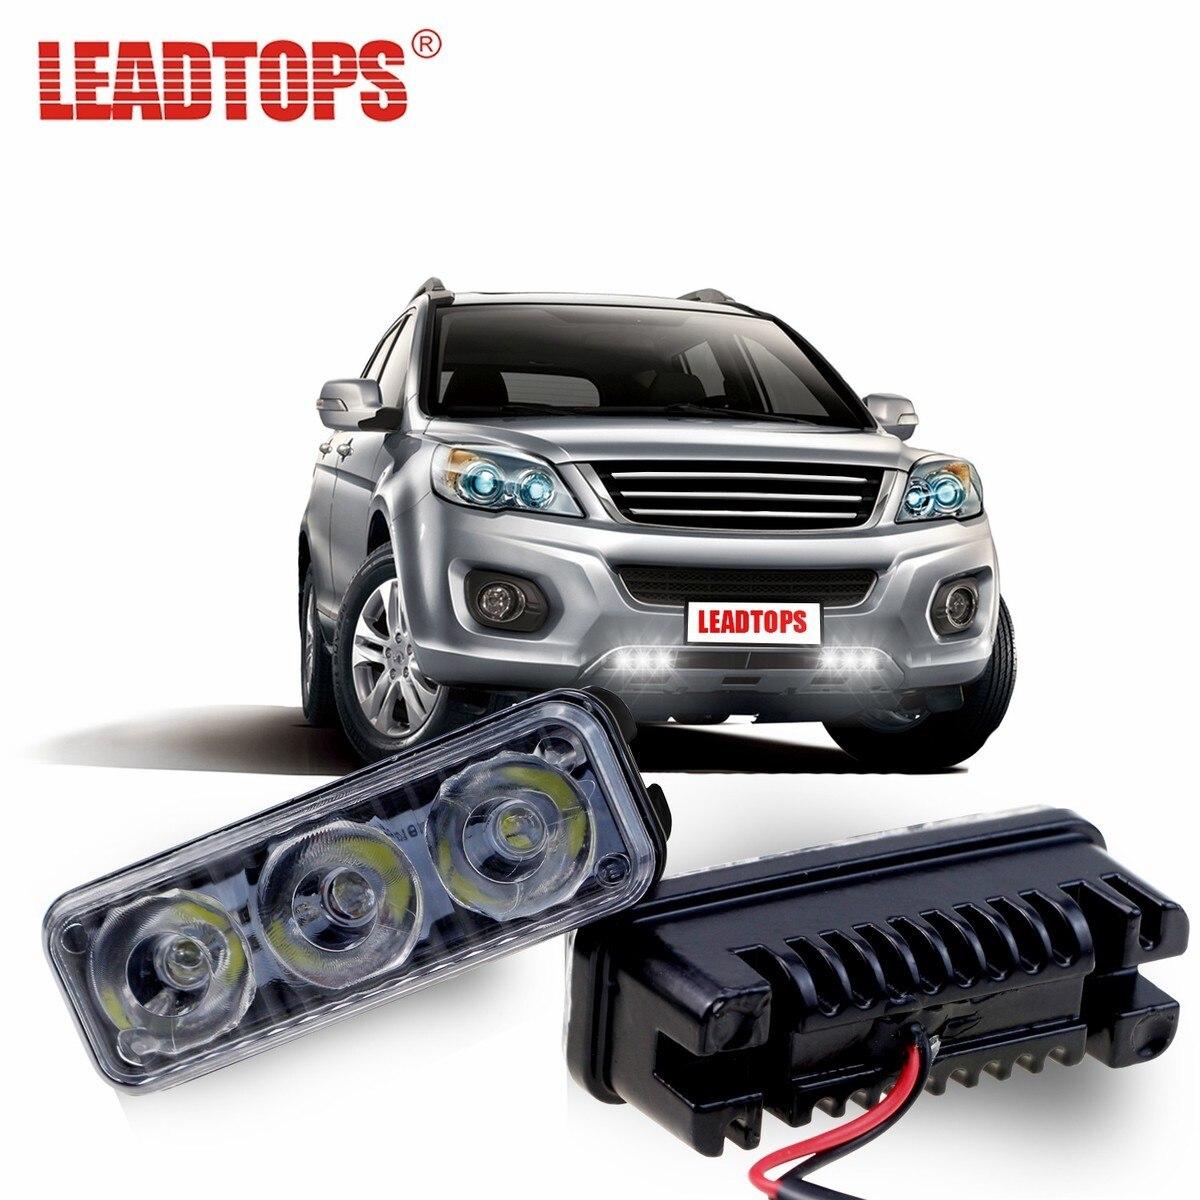 LEADTOPS Waterproof Car High Power Aluminum LED Daytime Running Lights With Lens DC12V Super White